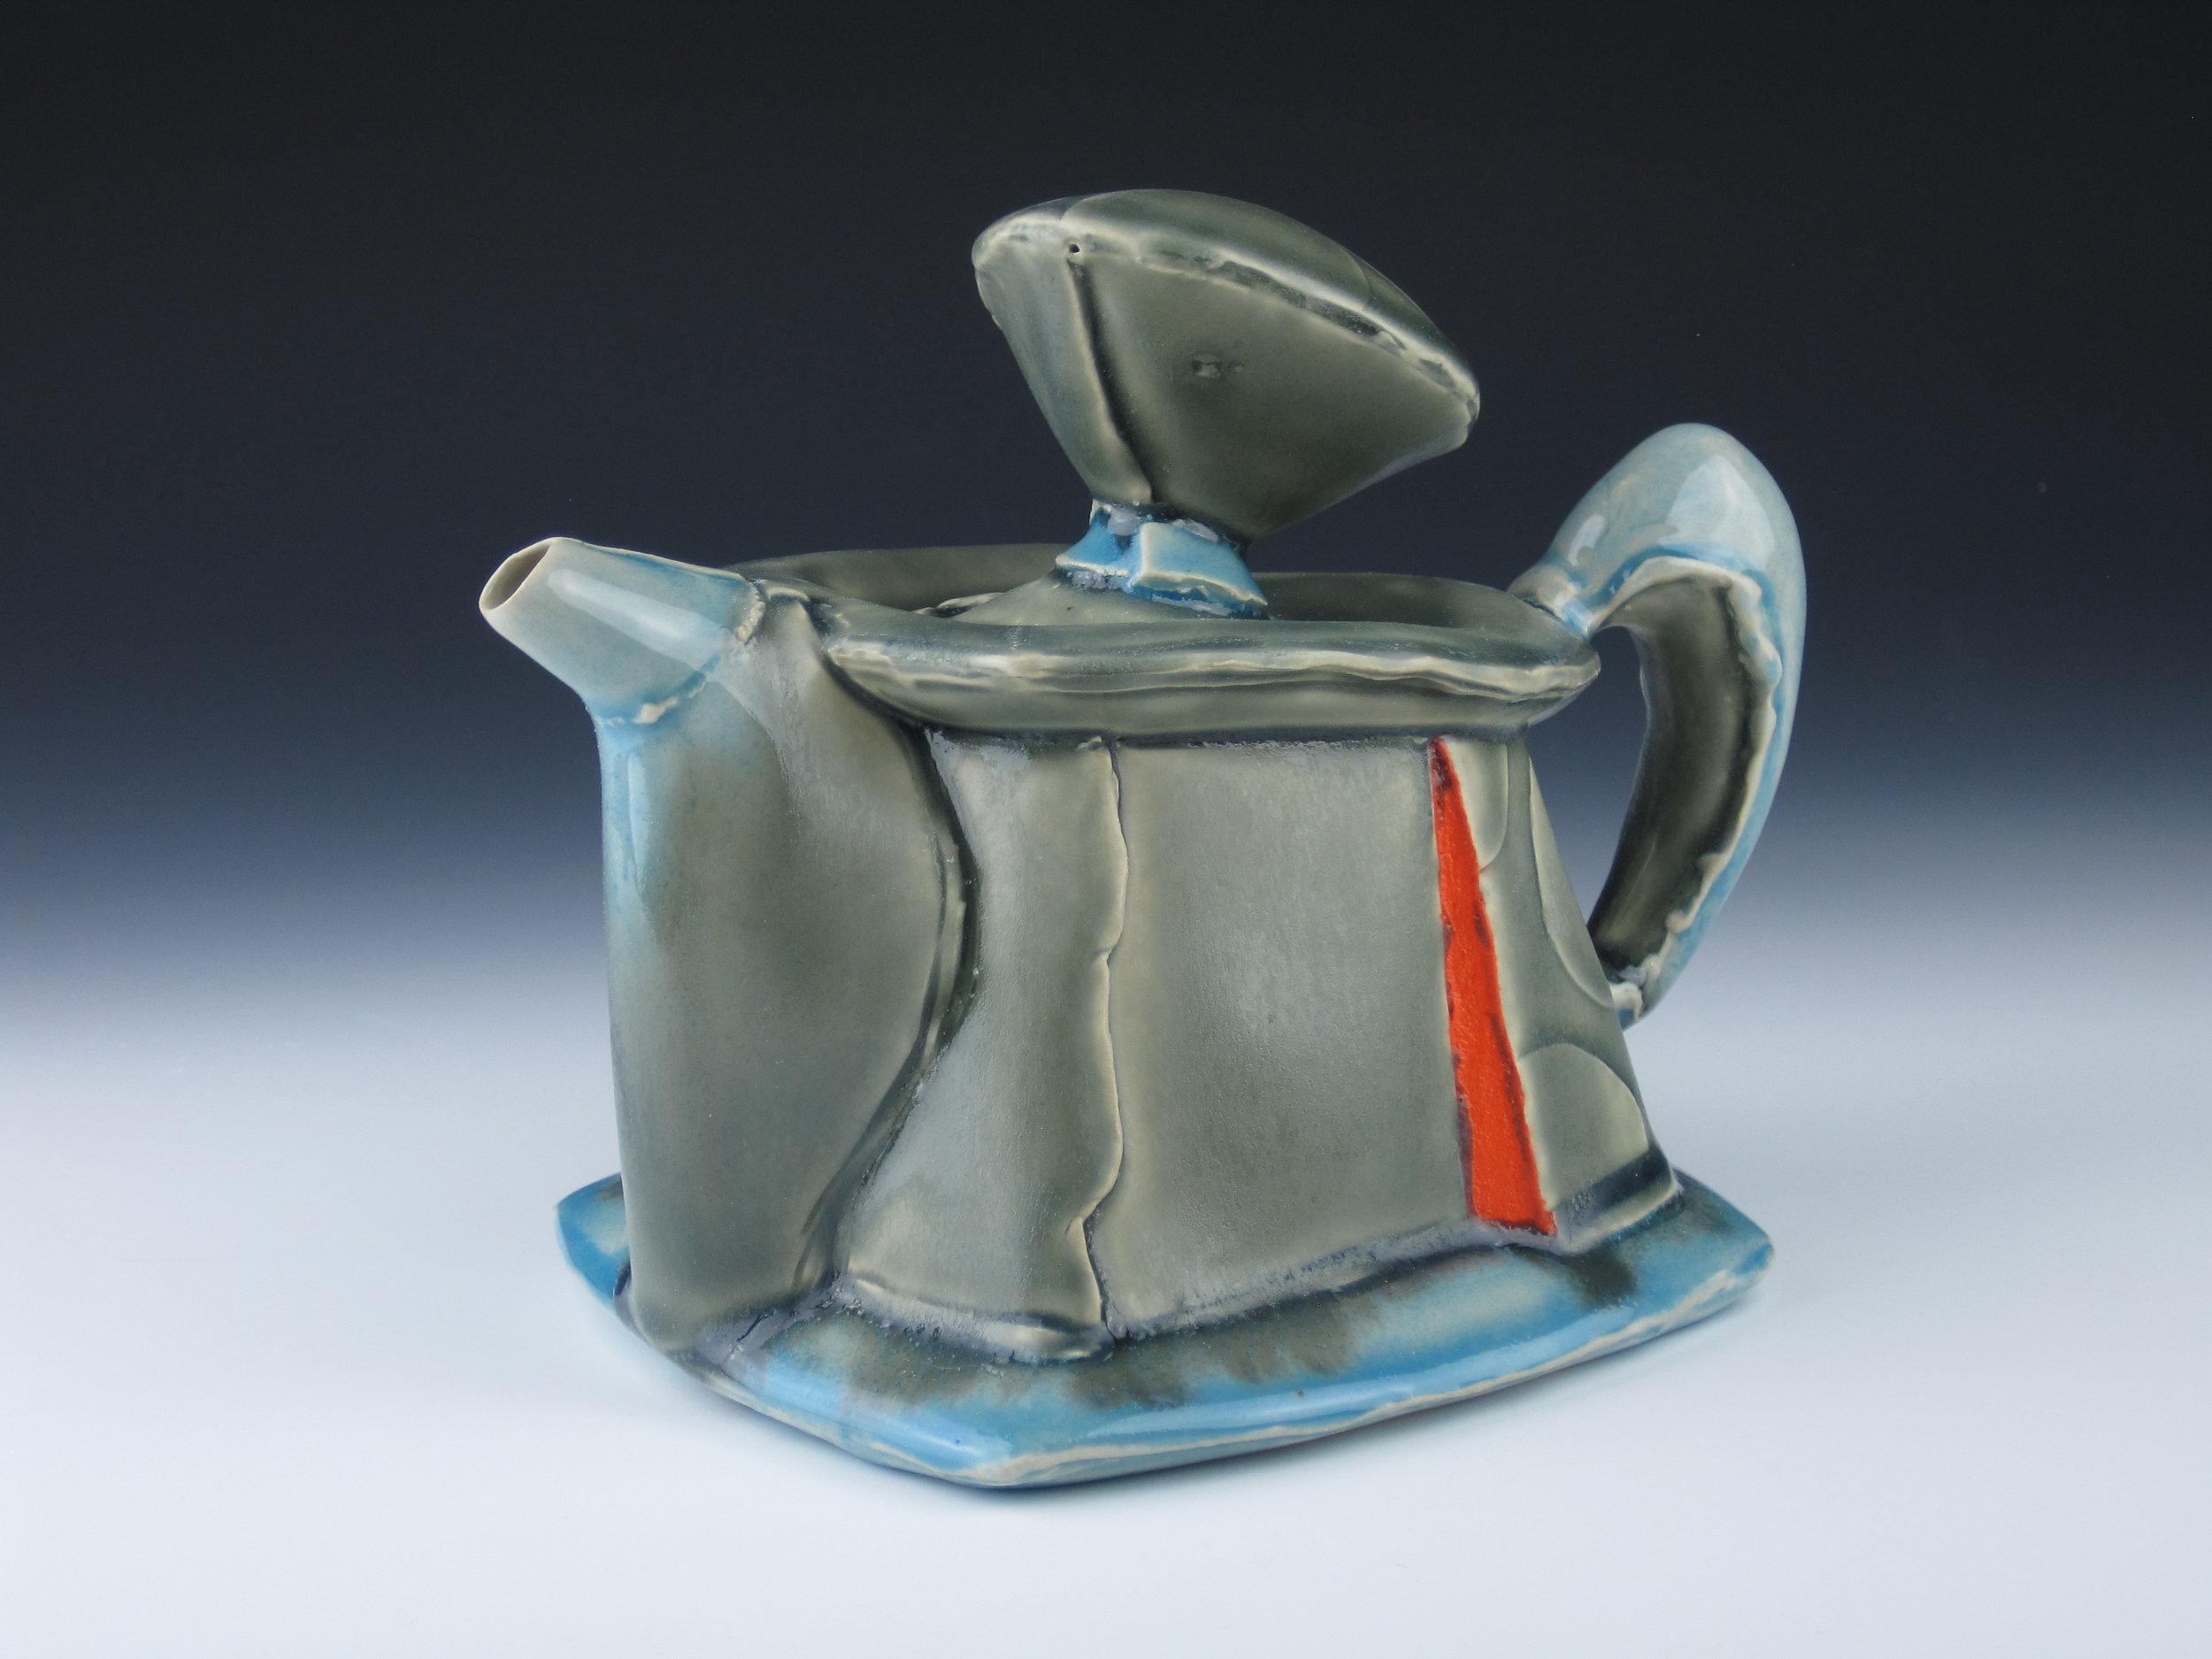 1.Pickett_Teapot.JPG